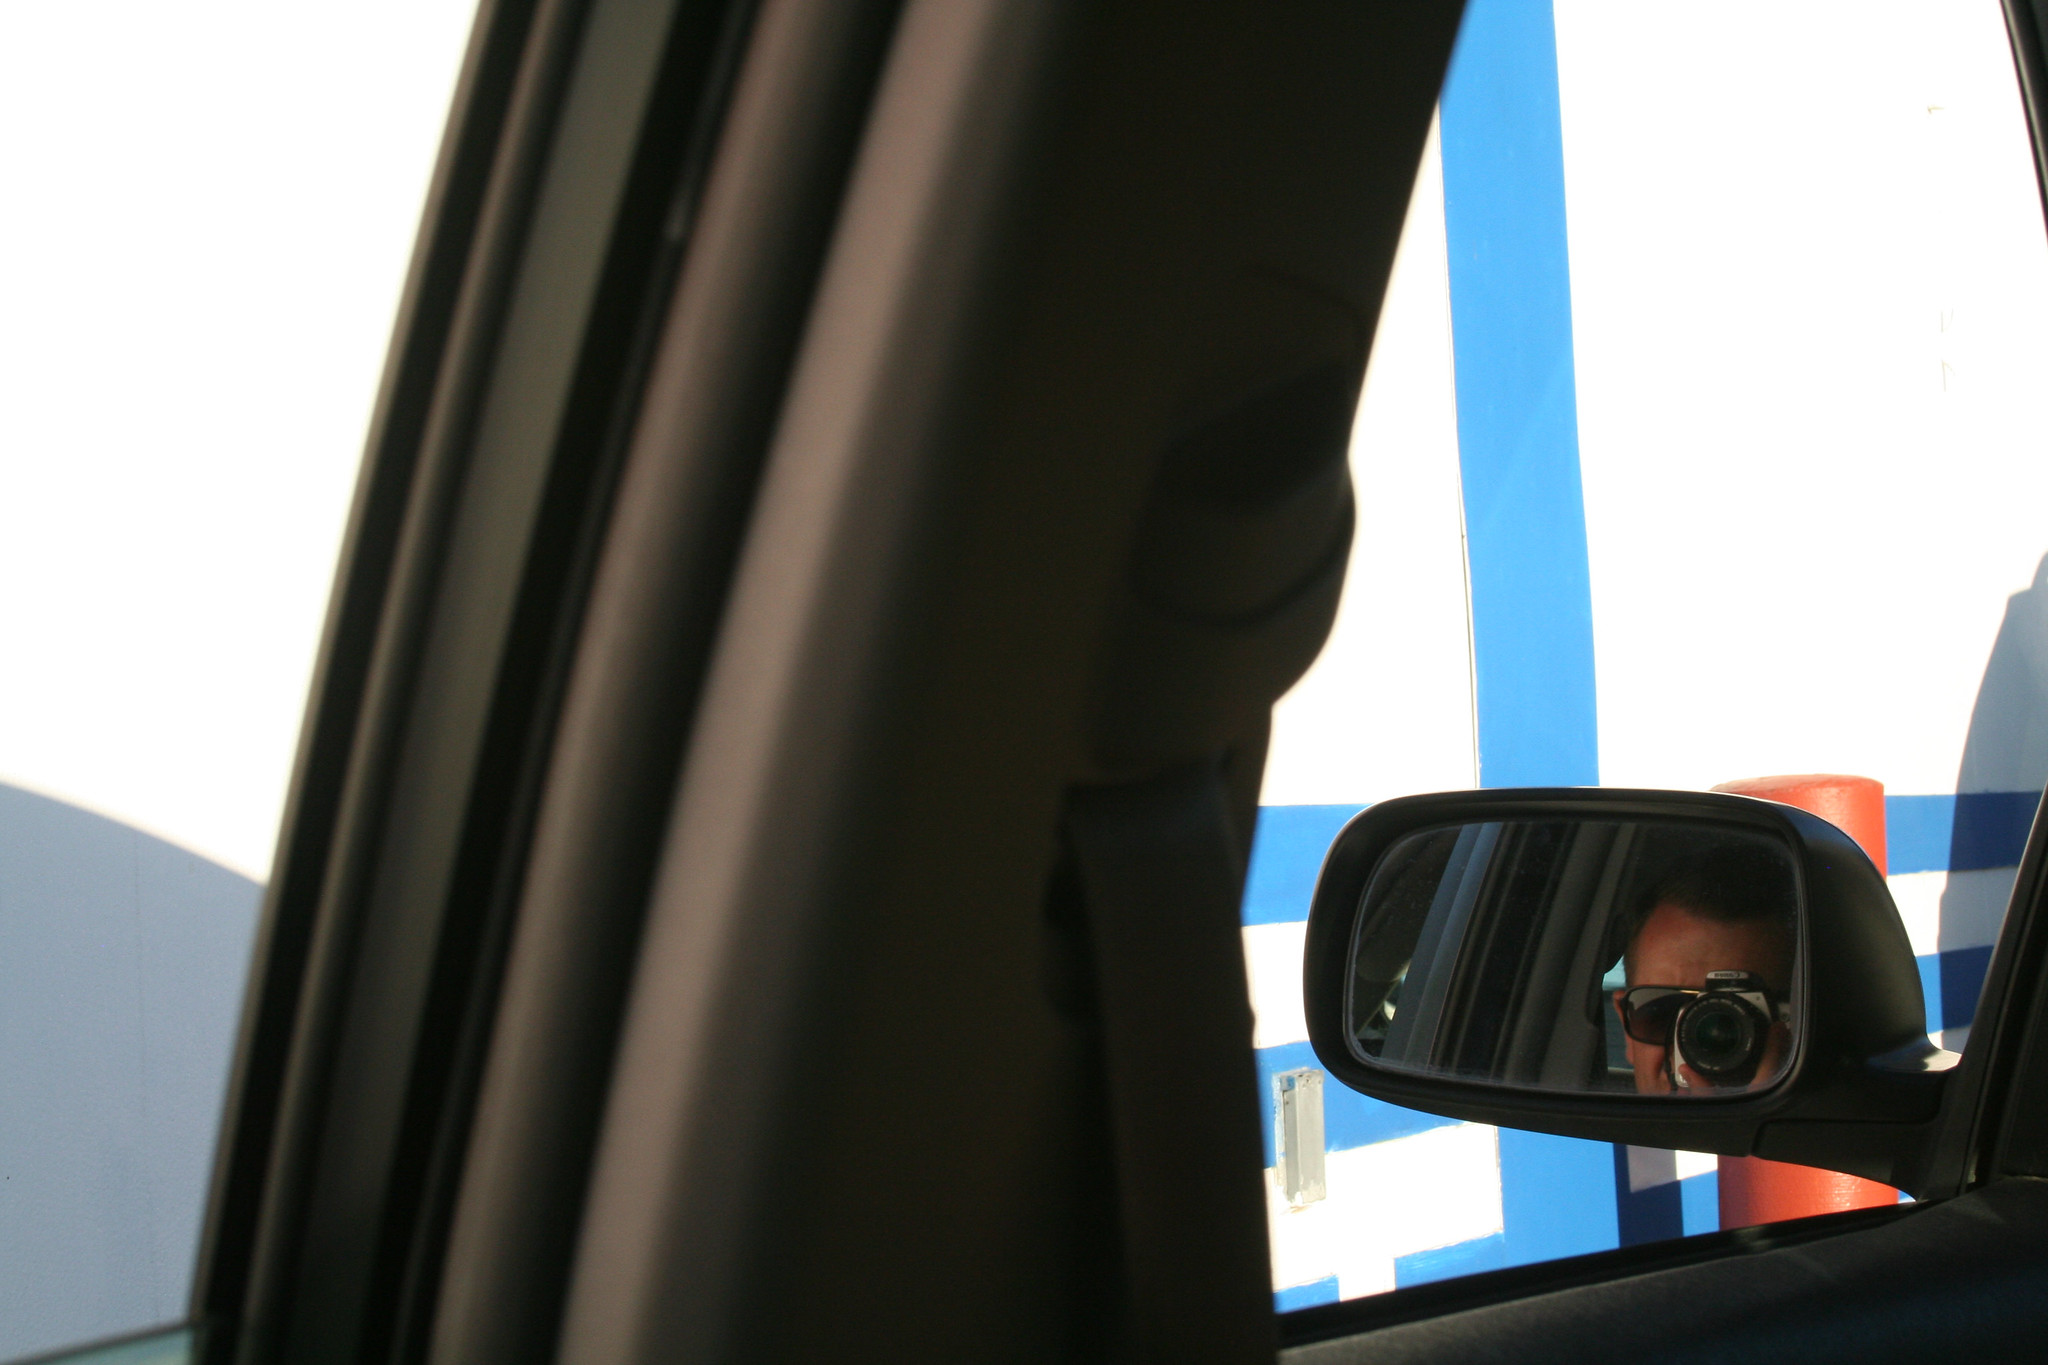 Creepy mirror shot